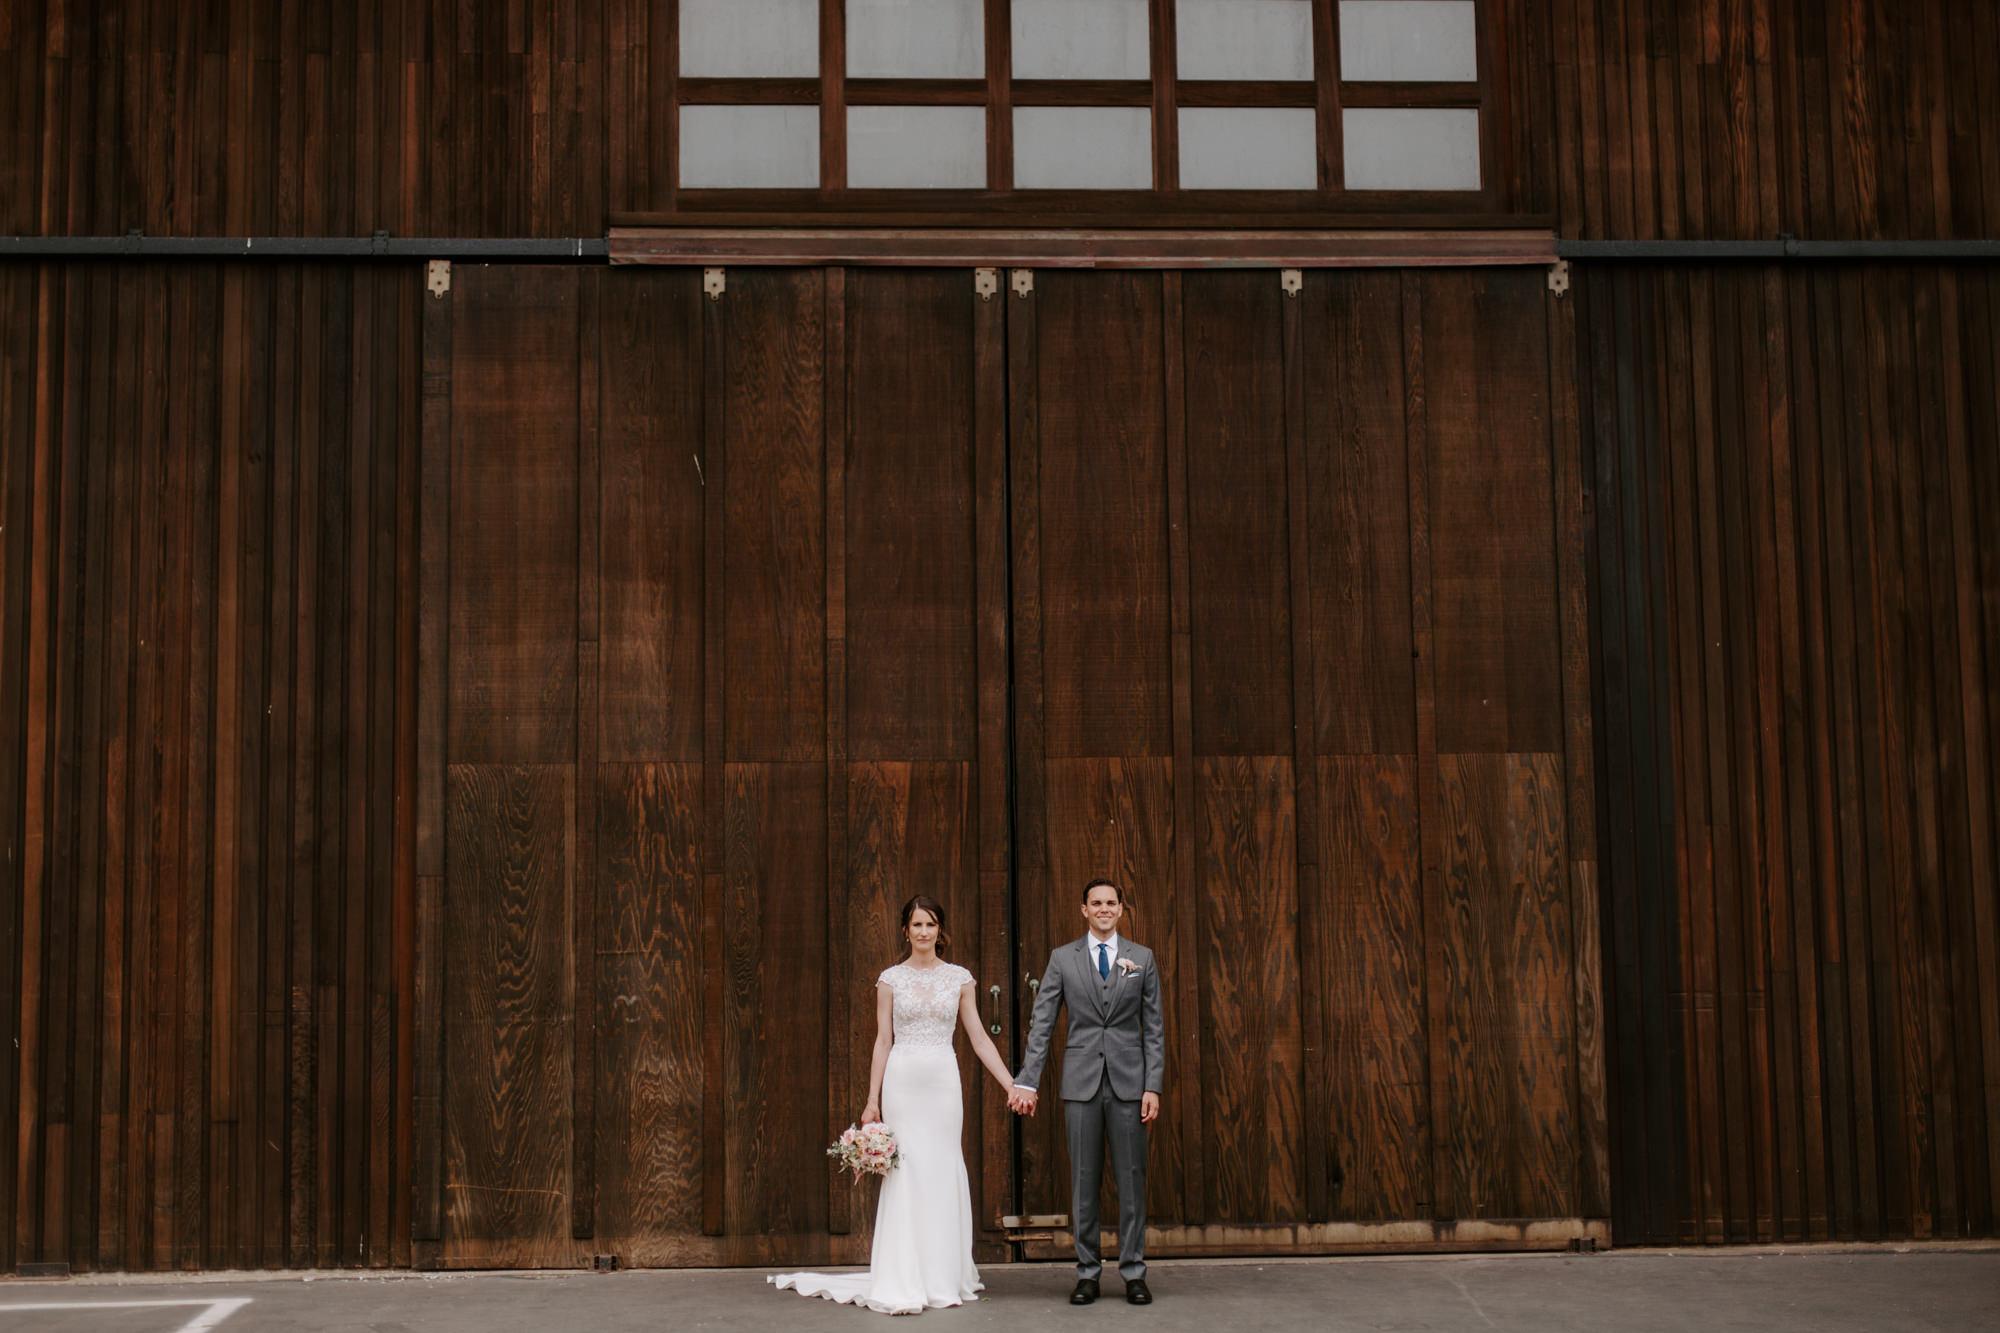 Martin Johnson house san diego wedding photography0038.jpg